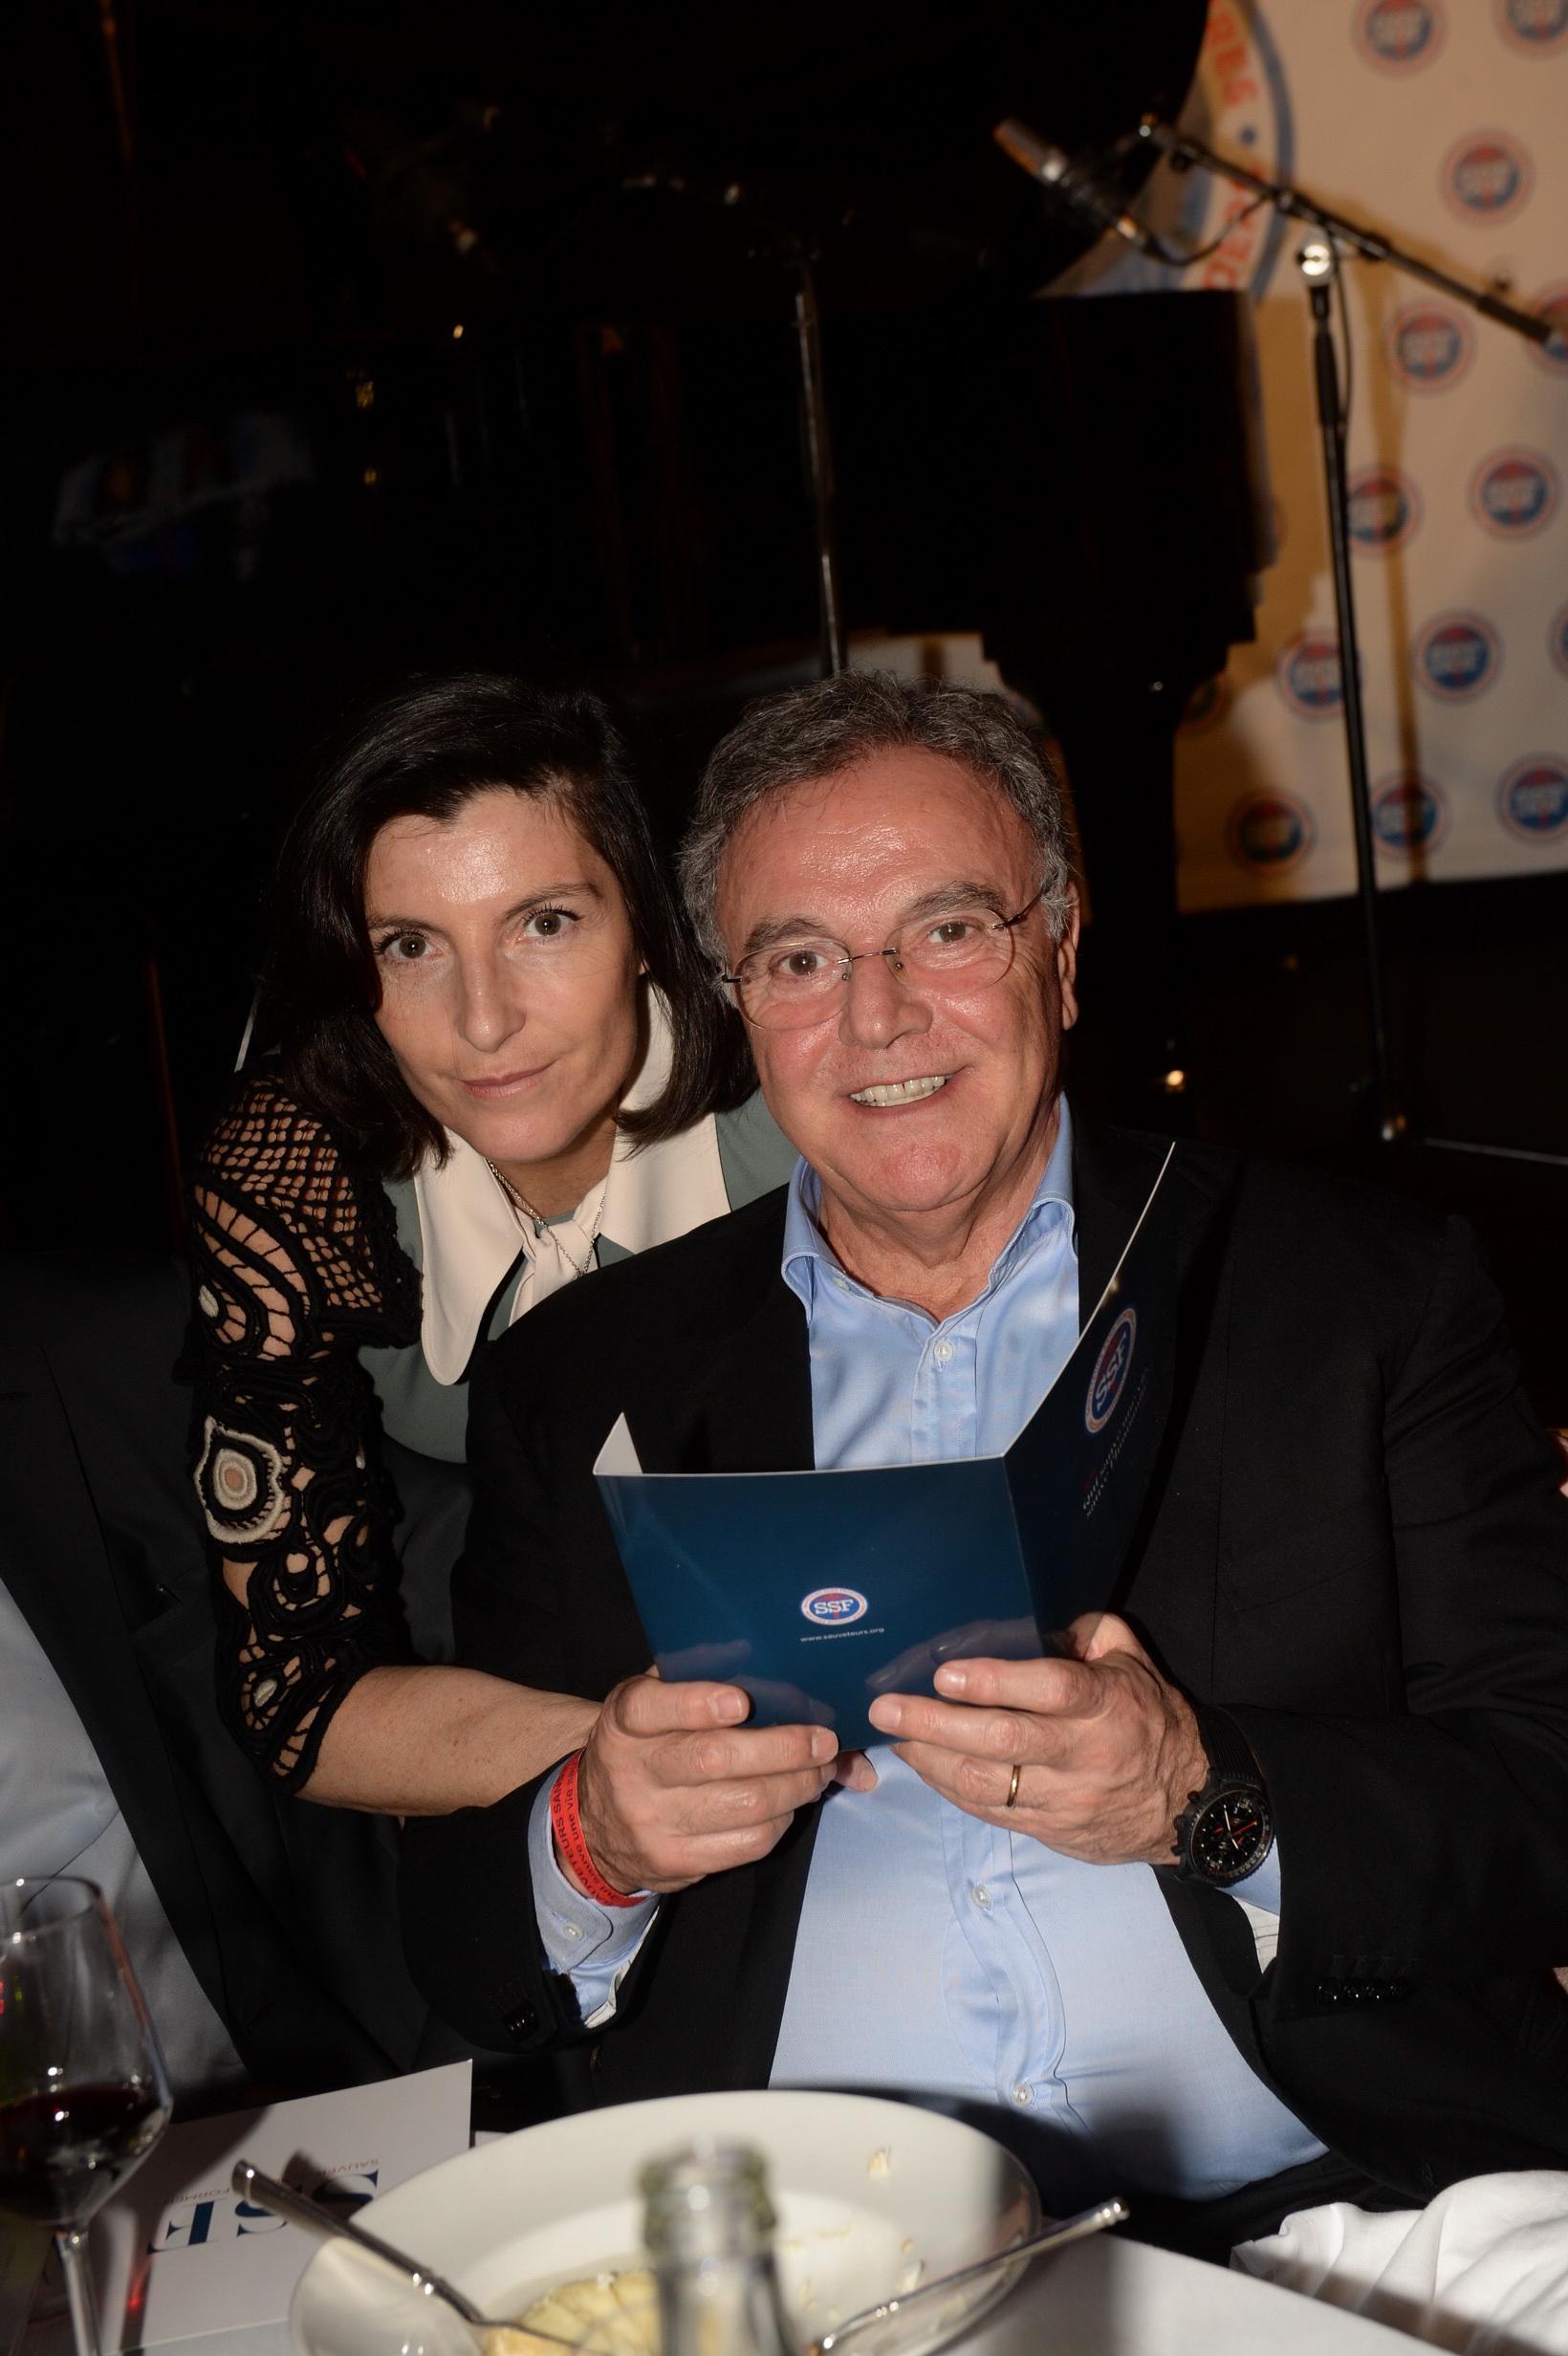 Alain Afflelou et sa femme Christine Coulaud